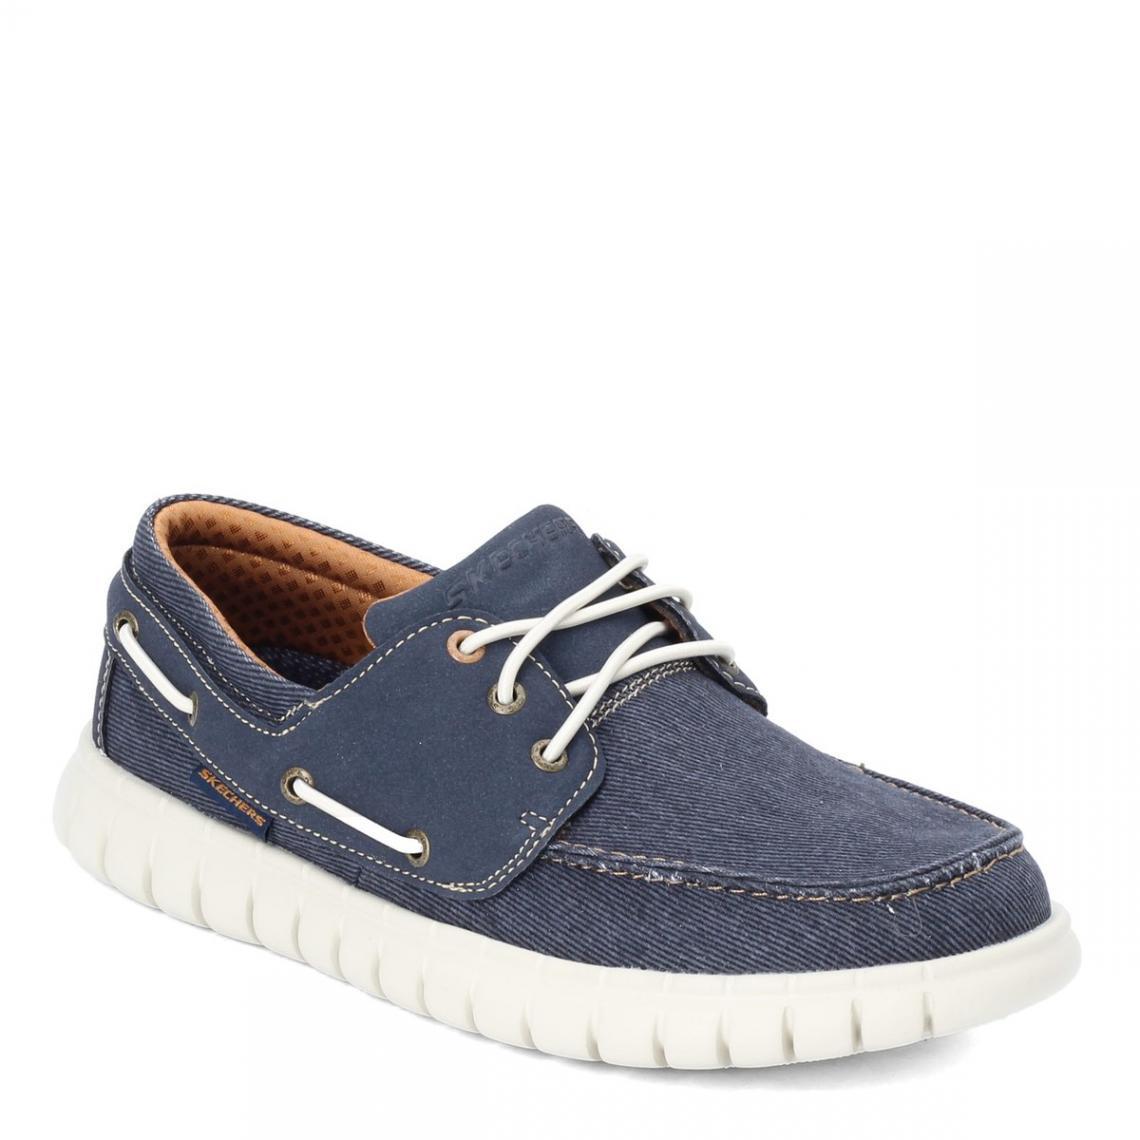 Promo : Chaussures Basses Marine - Moreway - Skechers - Modalova